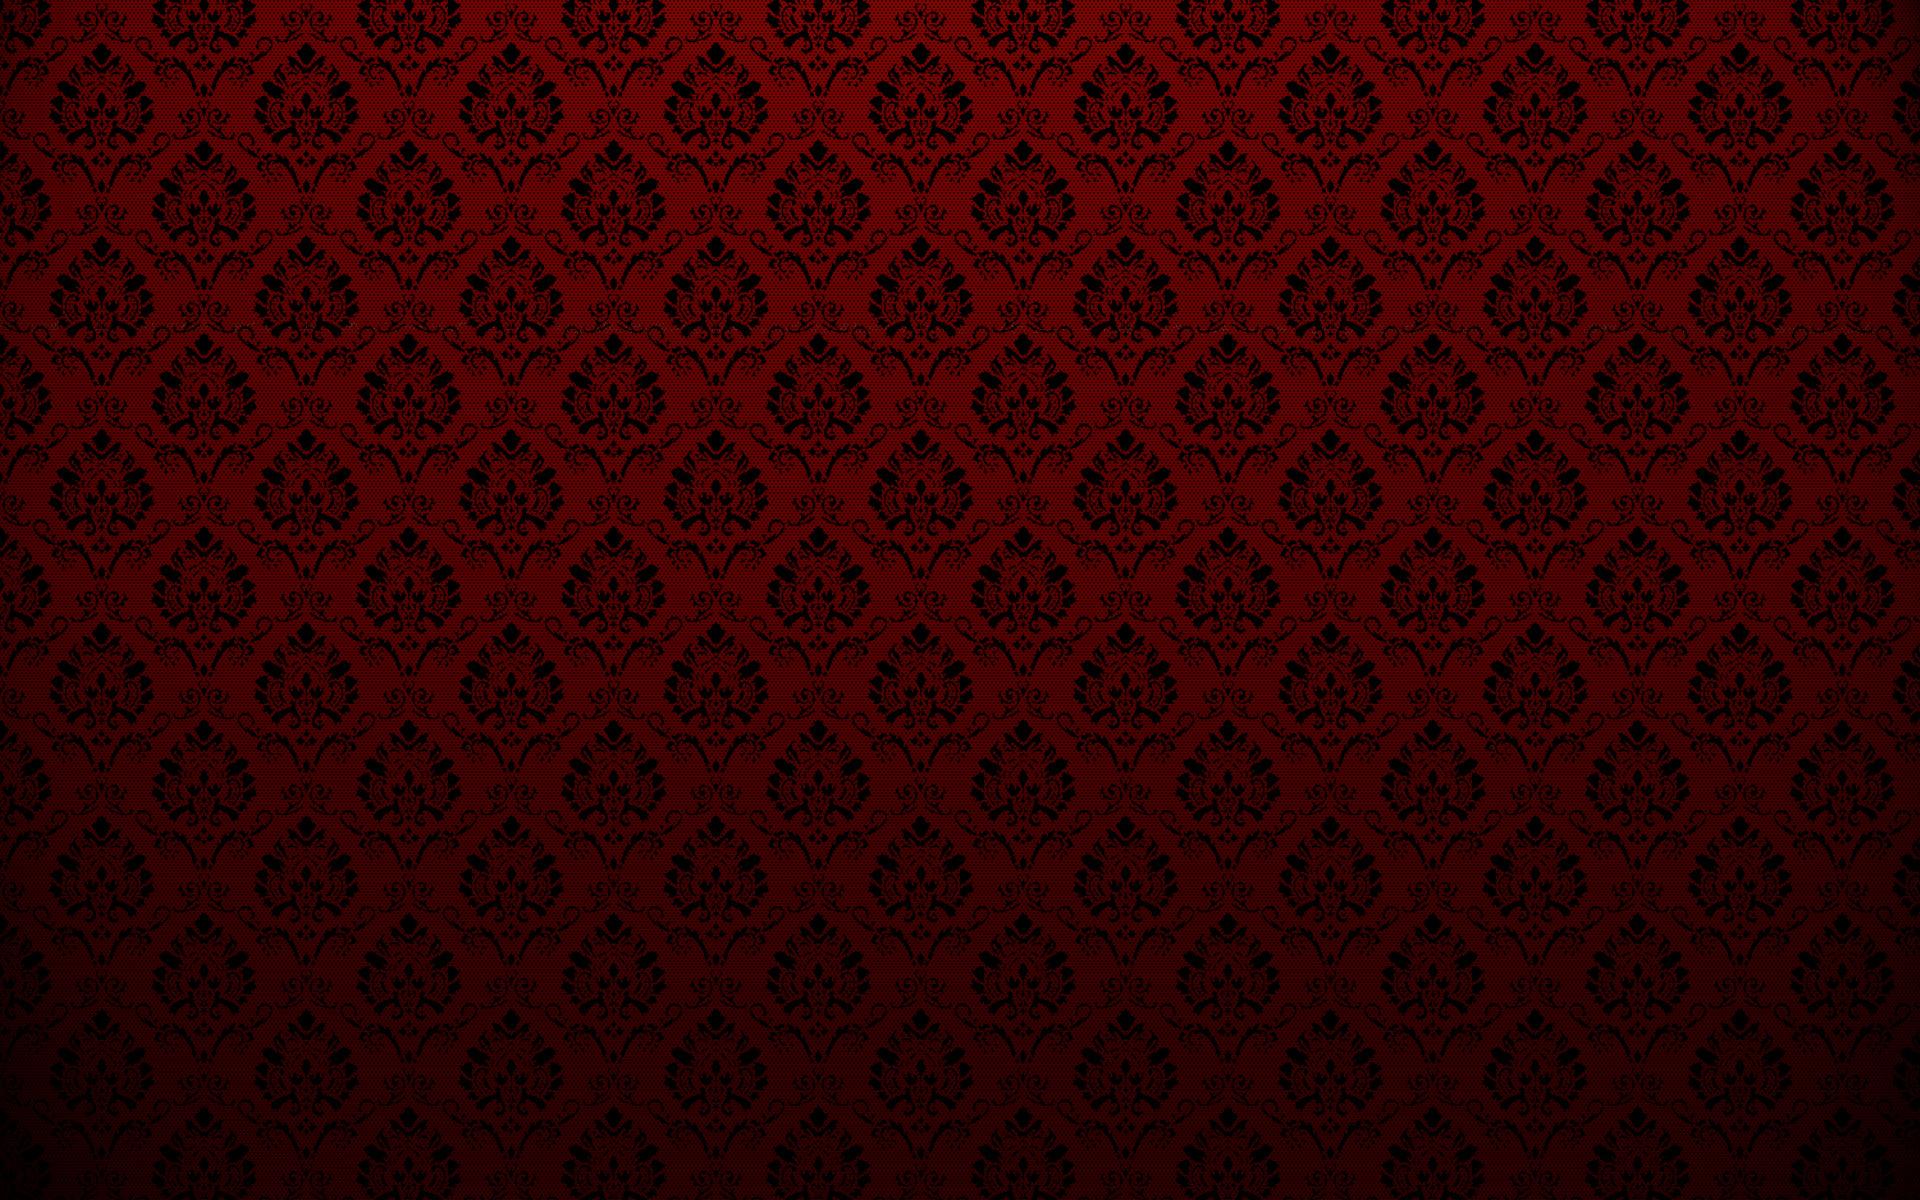 Red Wallpaper 24